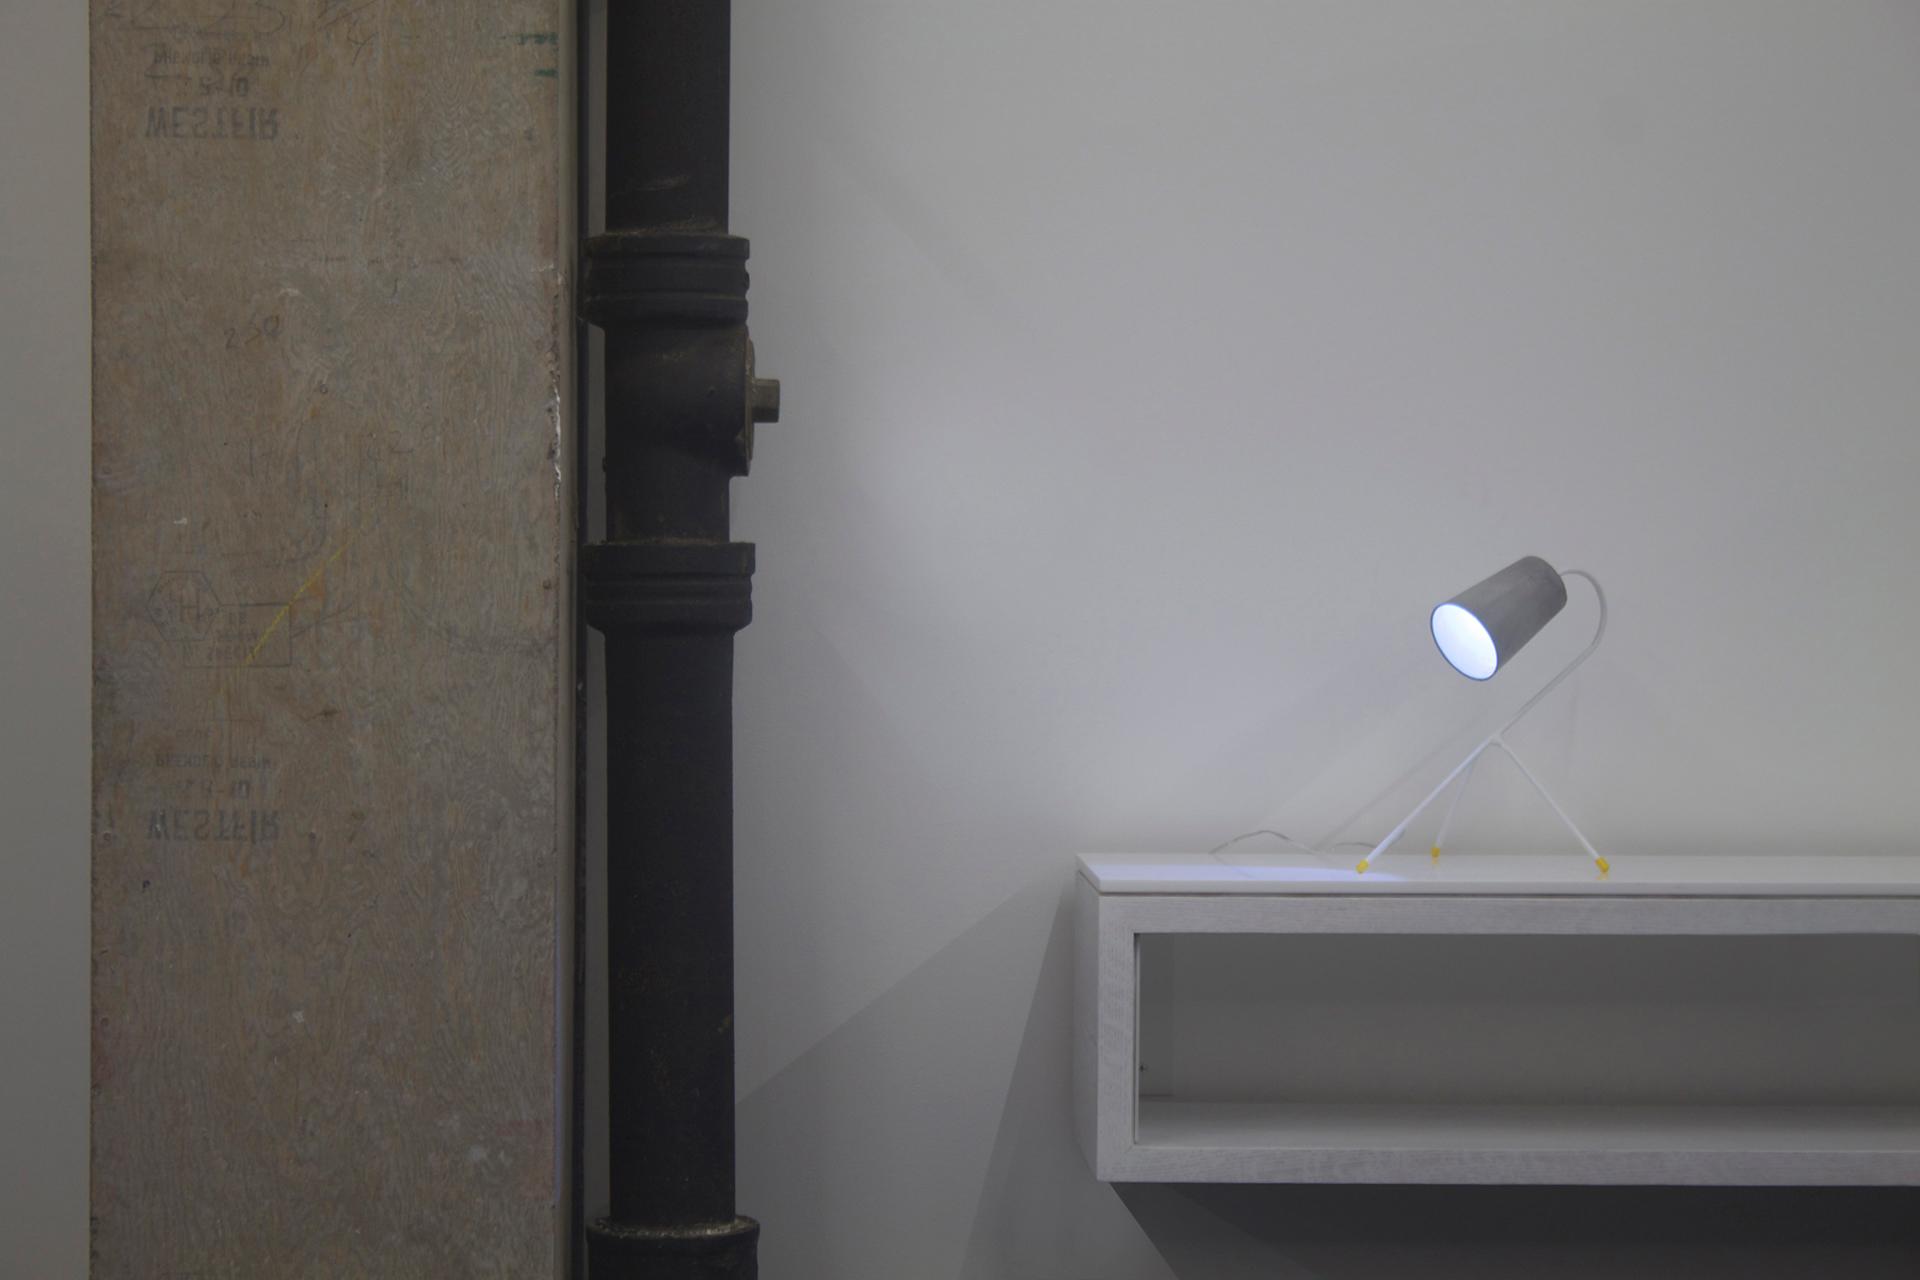 Levi-Robb-CL_2-Lamp-hisheji (7)